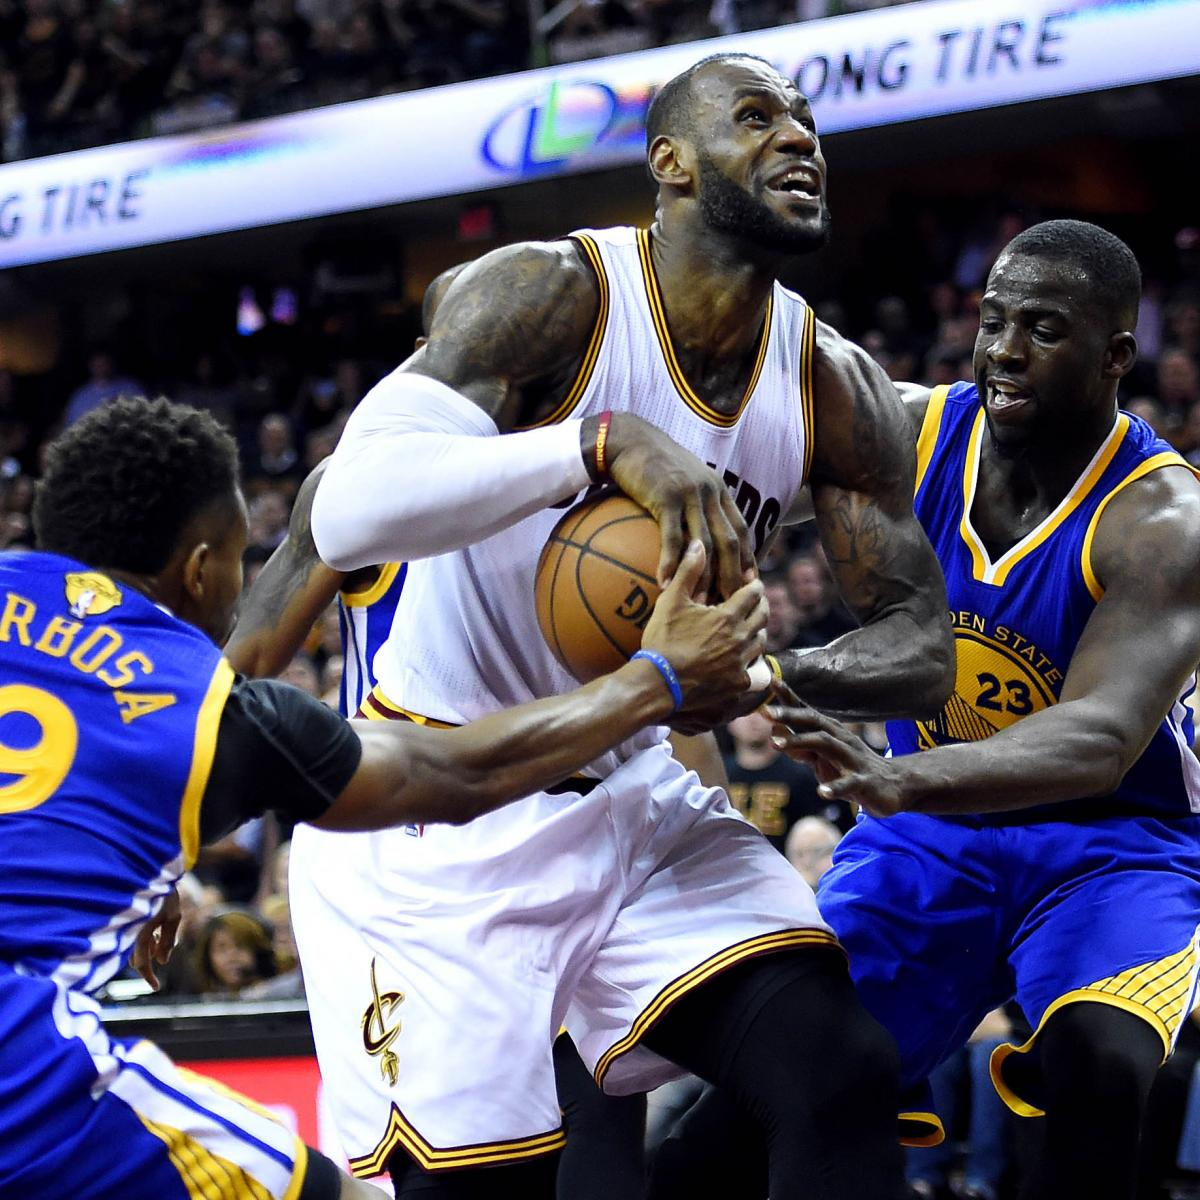 Boston Vs Warriors Live Stream Free: Warriors Vs Cleveland Full Game Highlights